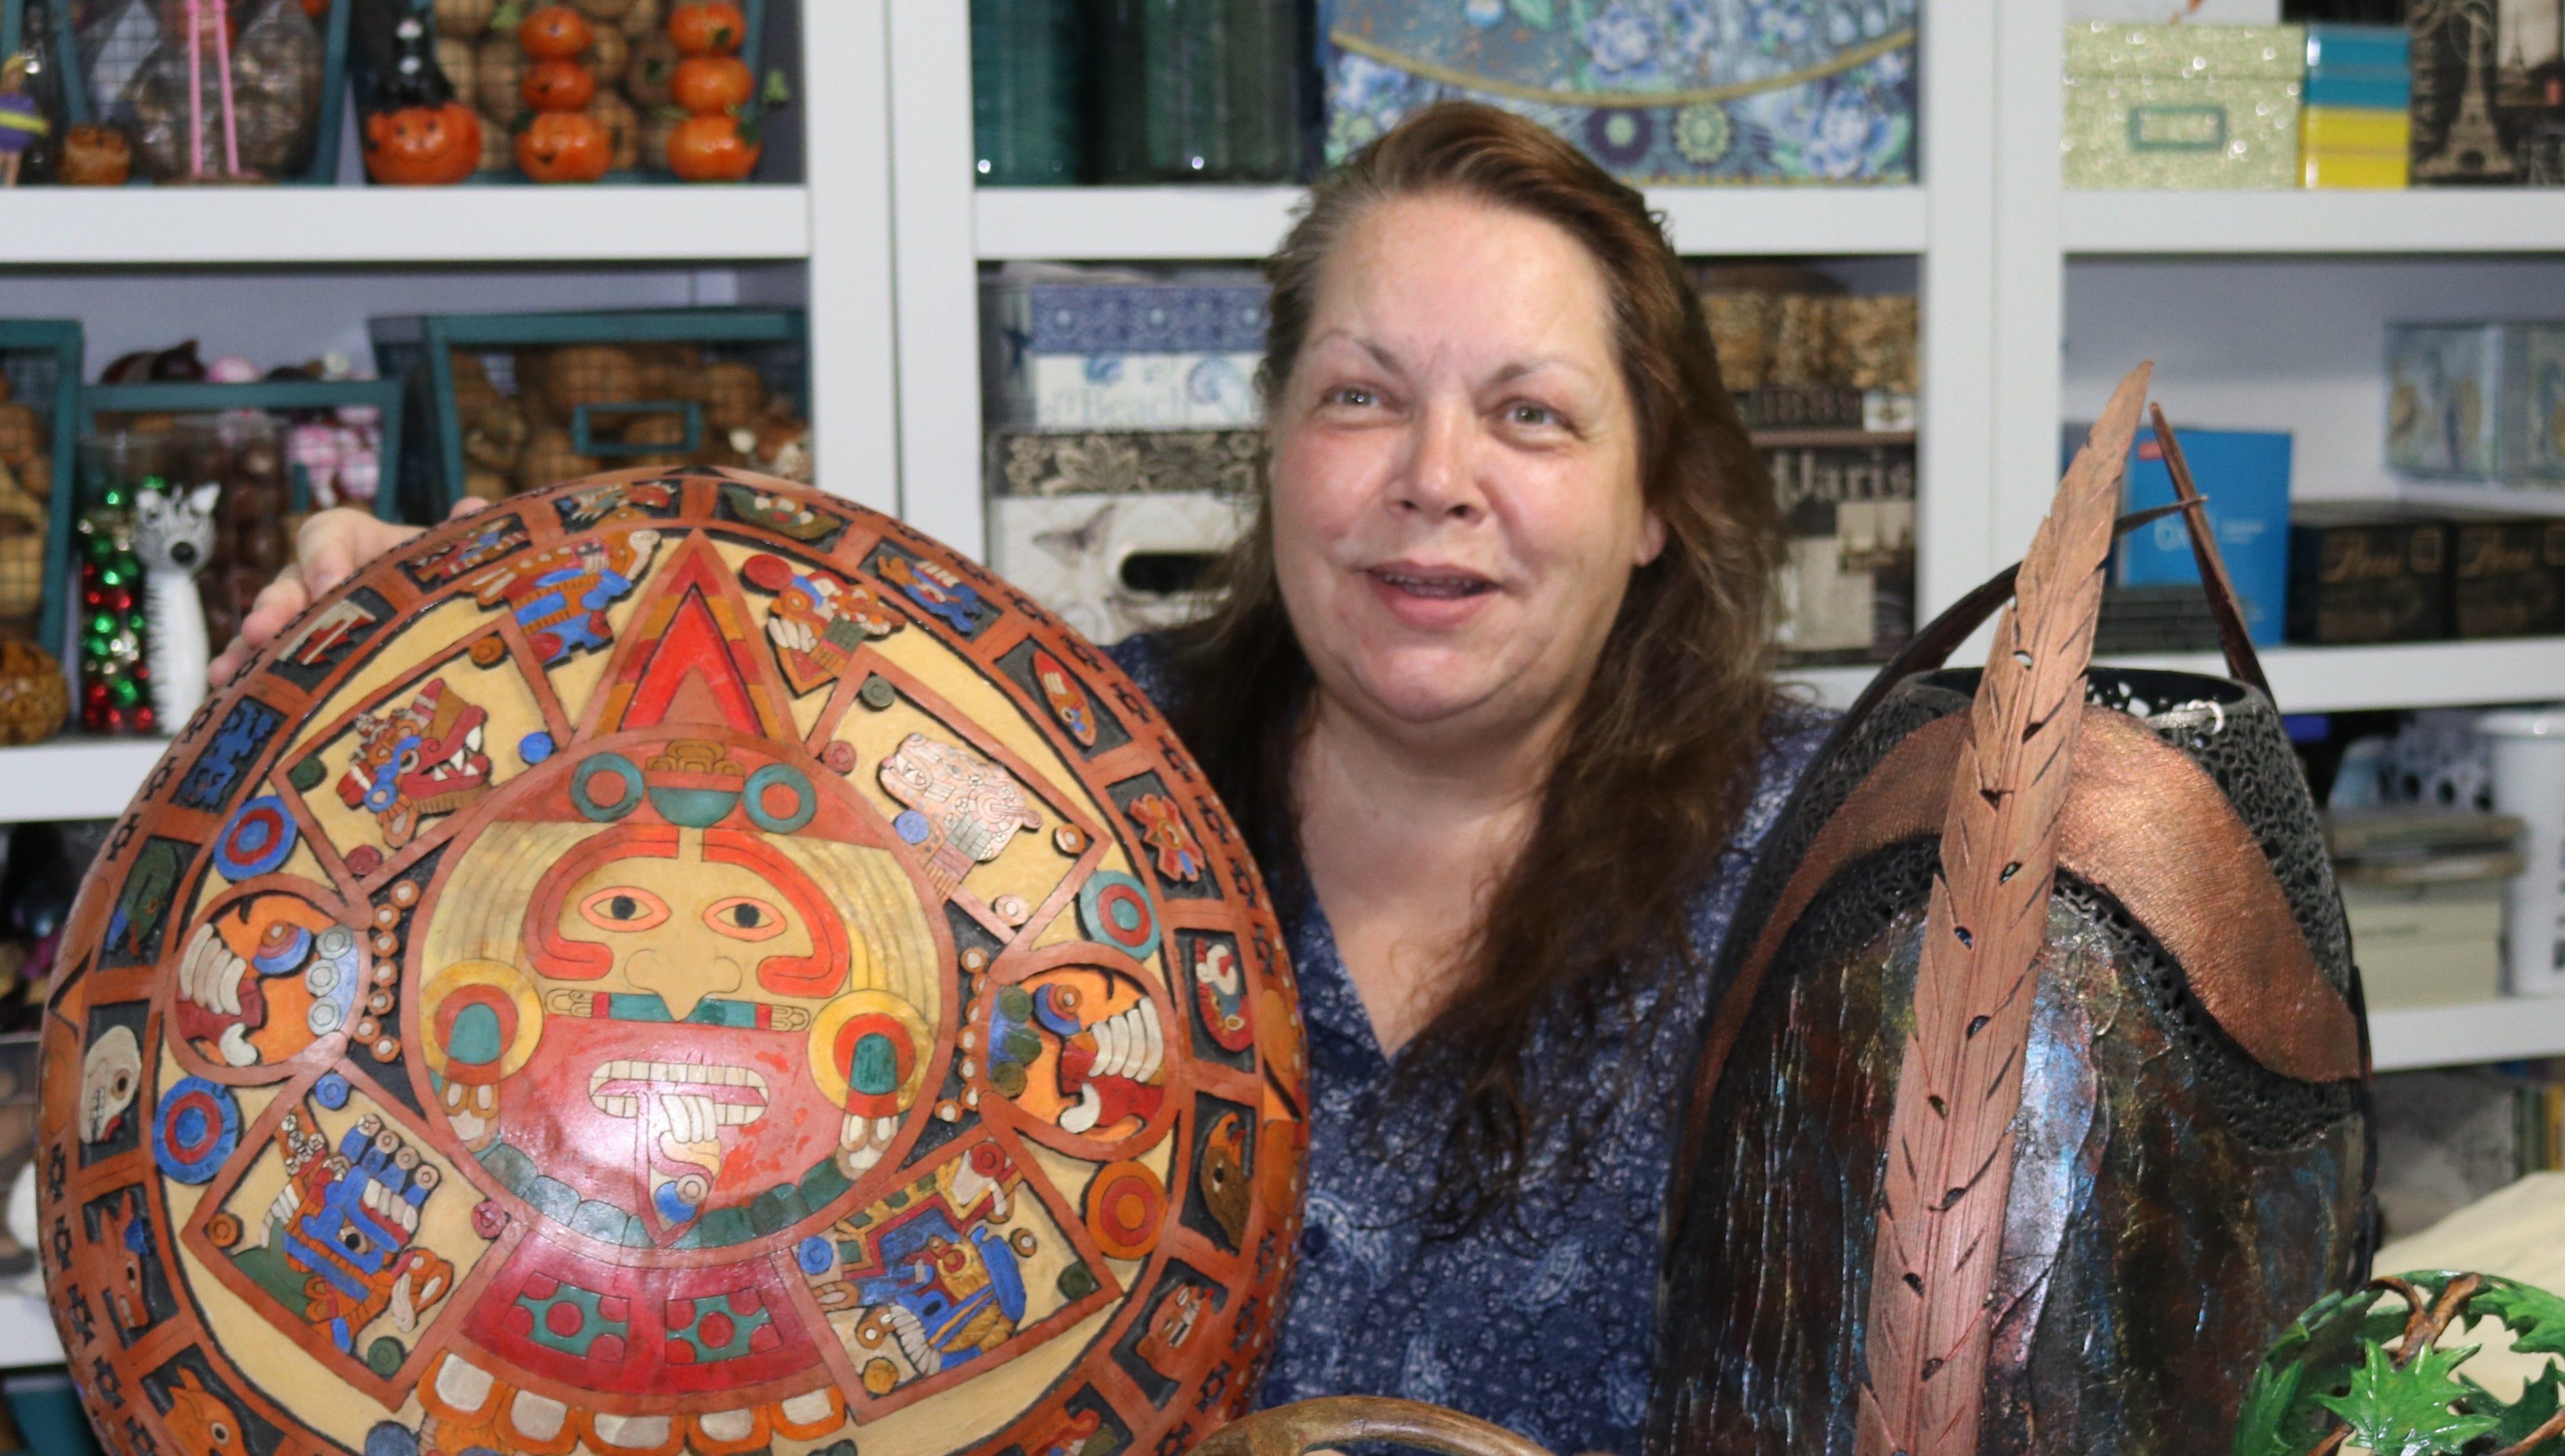 Handmade: Designer carves niche in world of gourd art